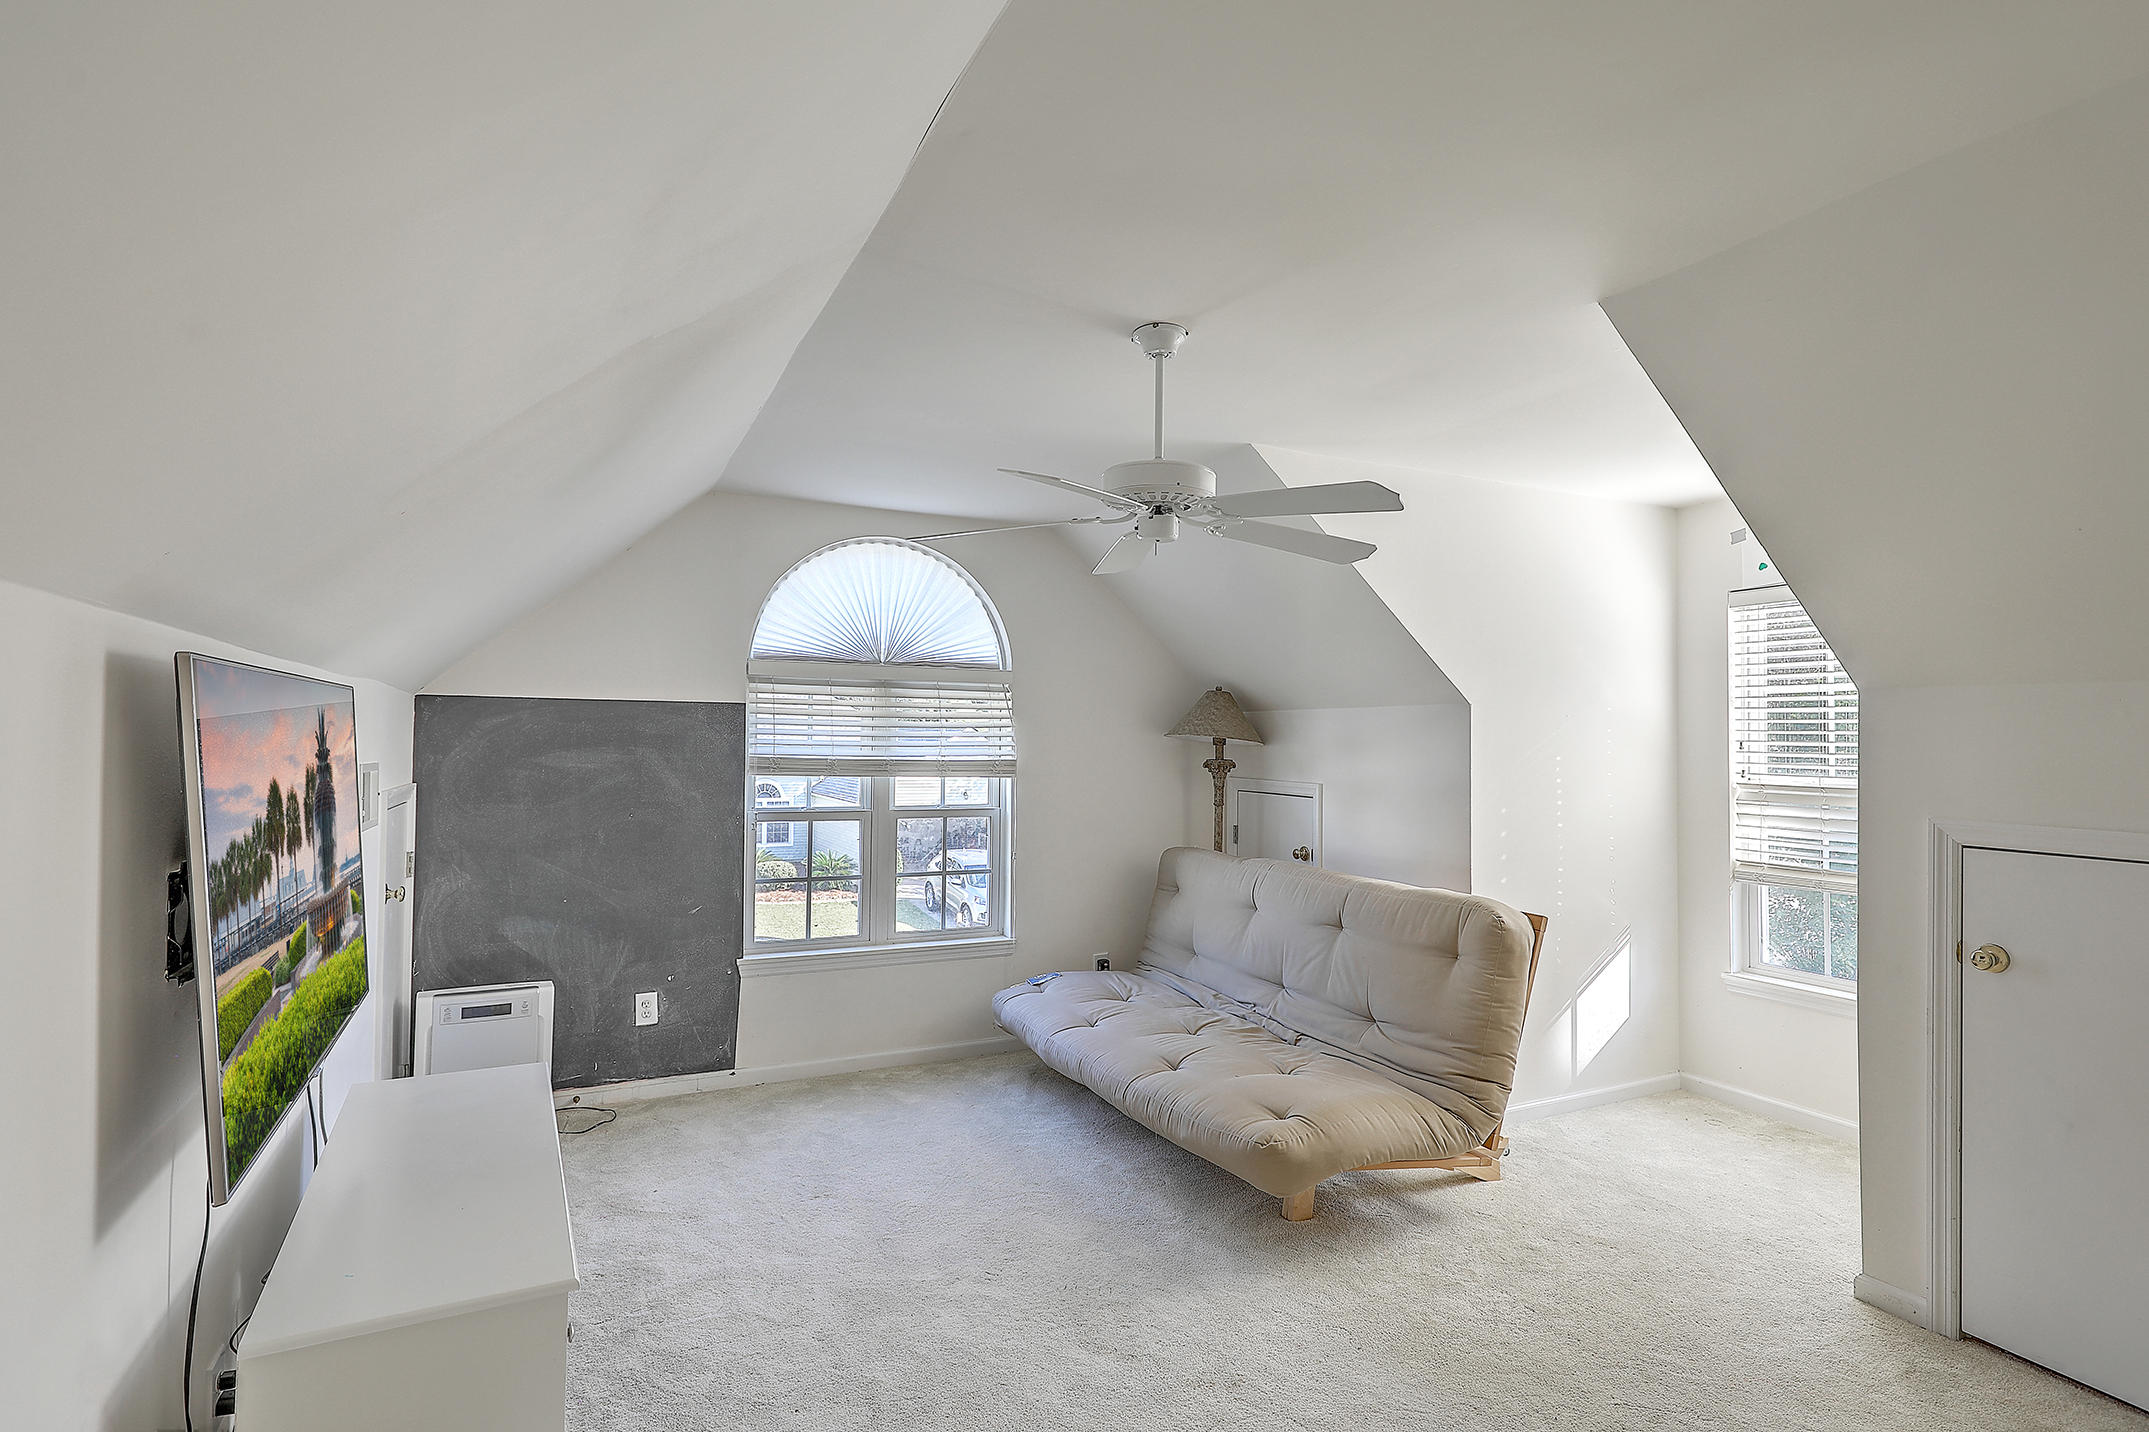 Dunes West Homes For Sale - 1471 Cypress Pointe, Mount Pleasant, SC - 14